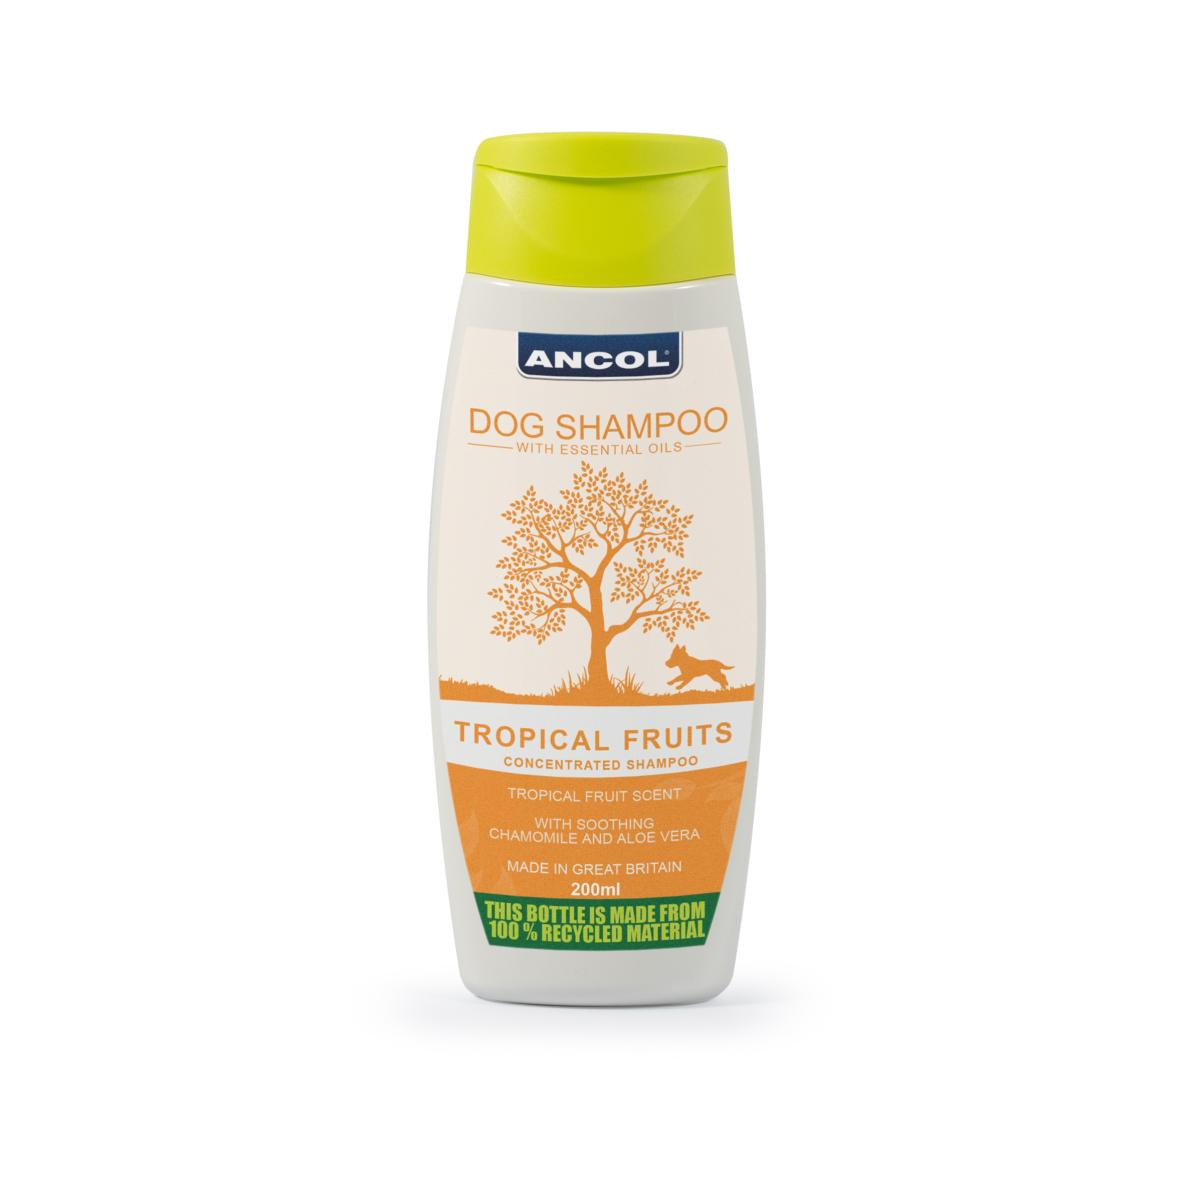 CLEARANCE ANCOL Tropical Fruits Dog Shampoo 200ml